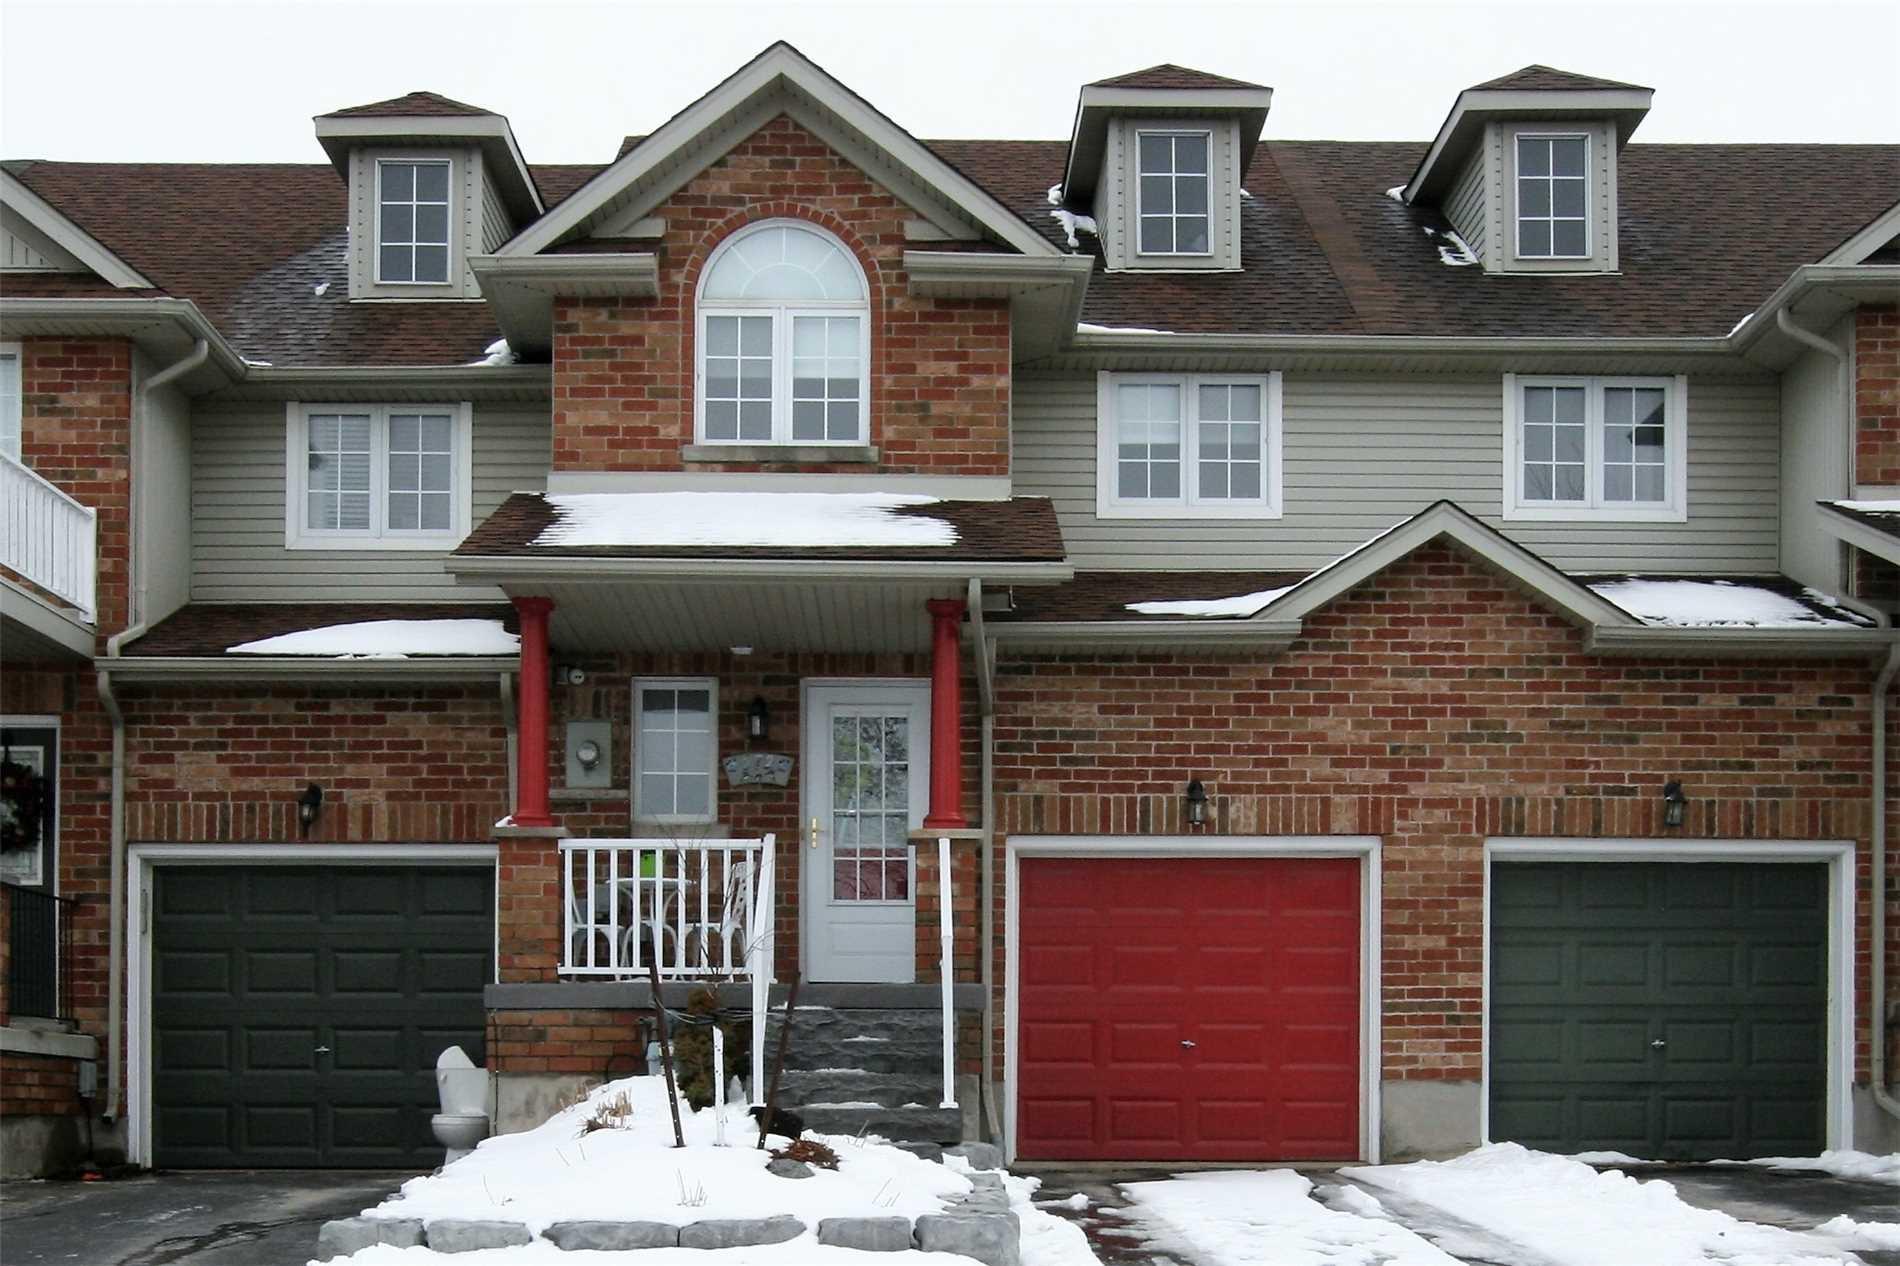 Main Photo: 272 Elderberry Street: Orangeville House (2-Storey) for sale : MLS®# W4402096